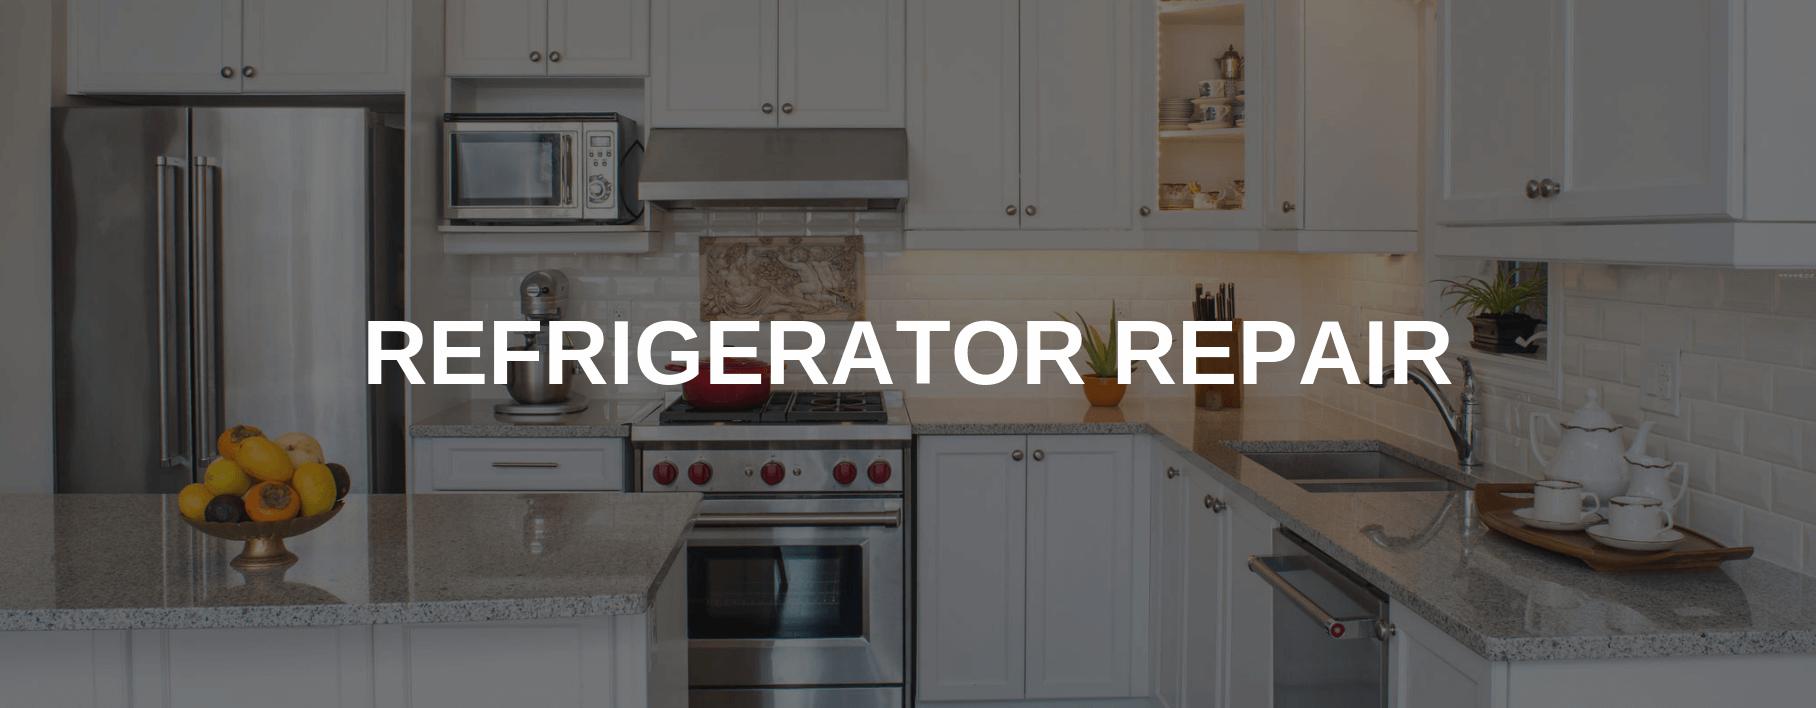 refrigerator repair baytown